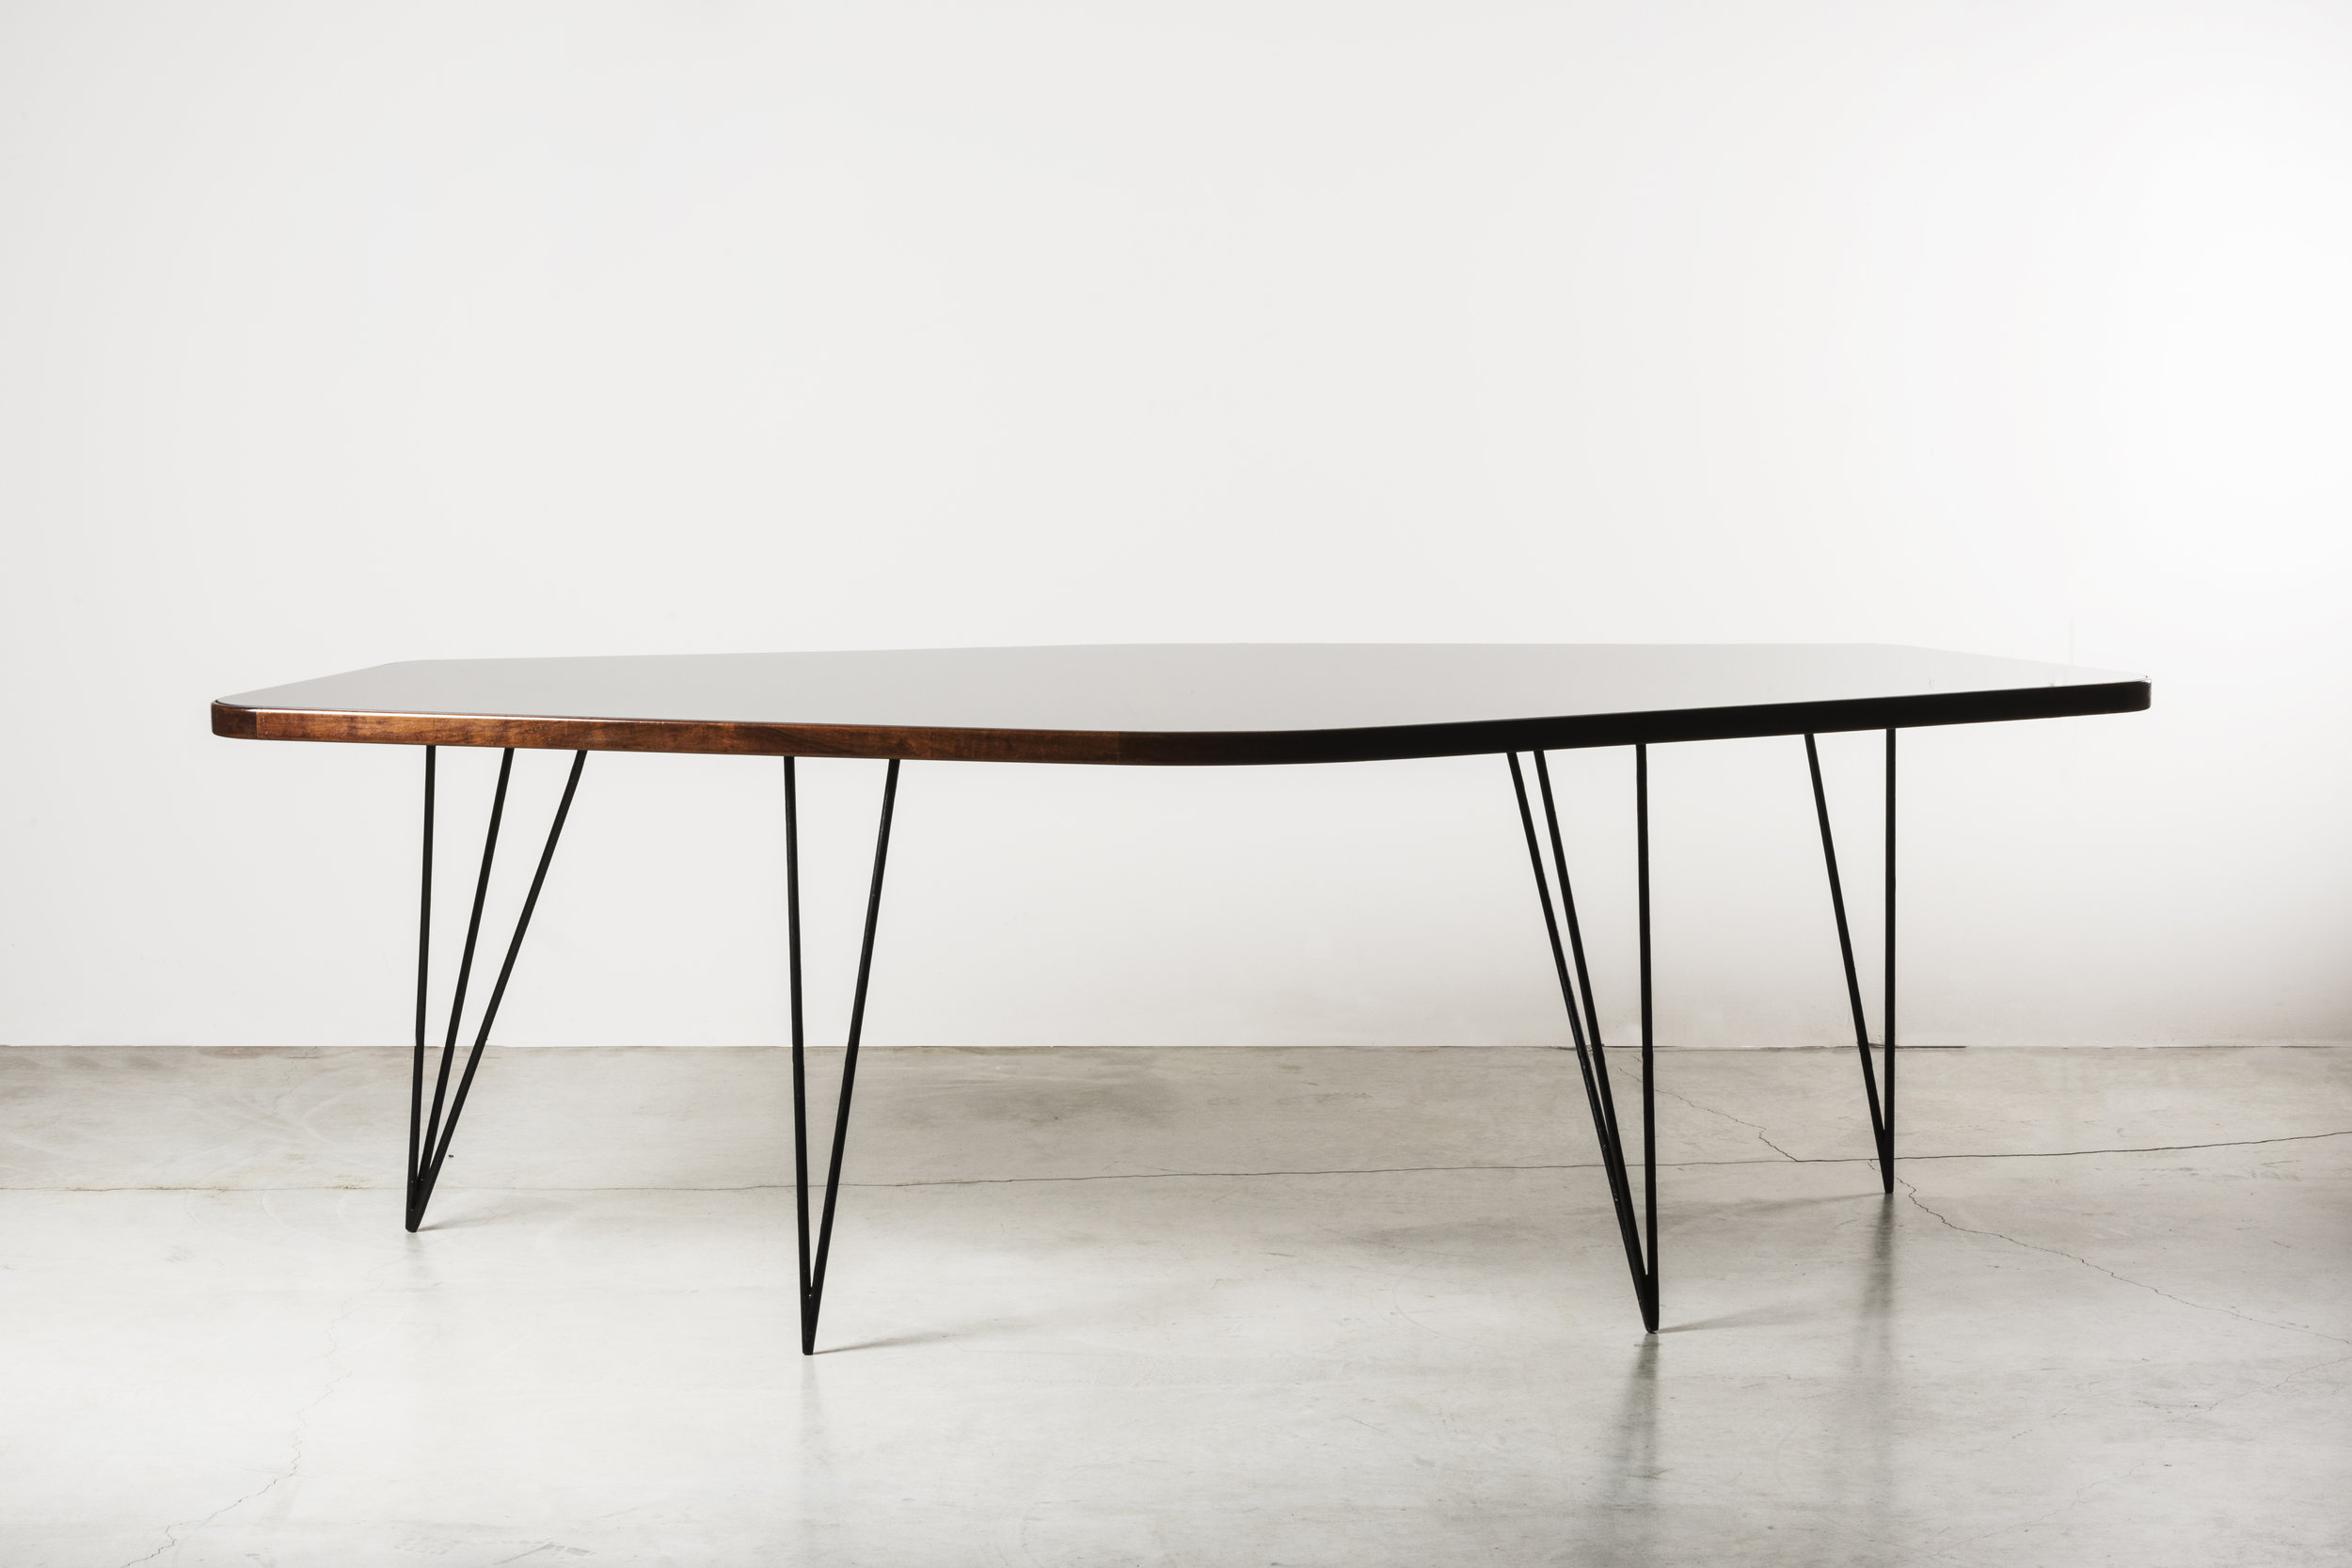 Poligonal table, Brazil, 1958  Design: Joaquim Tenreiro Ebonized jacaranda wood, painted steel, backpainted glass  size: 234 x 108.6 x h74 cm / 92 x 42.8 x h 29 in  ⓒ Nilufar Gallery